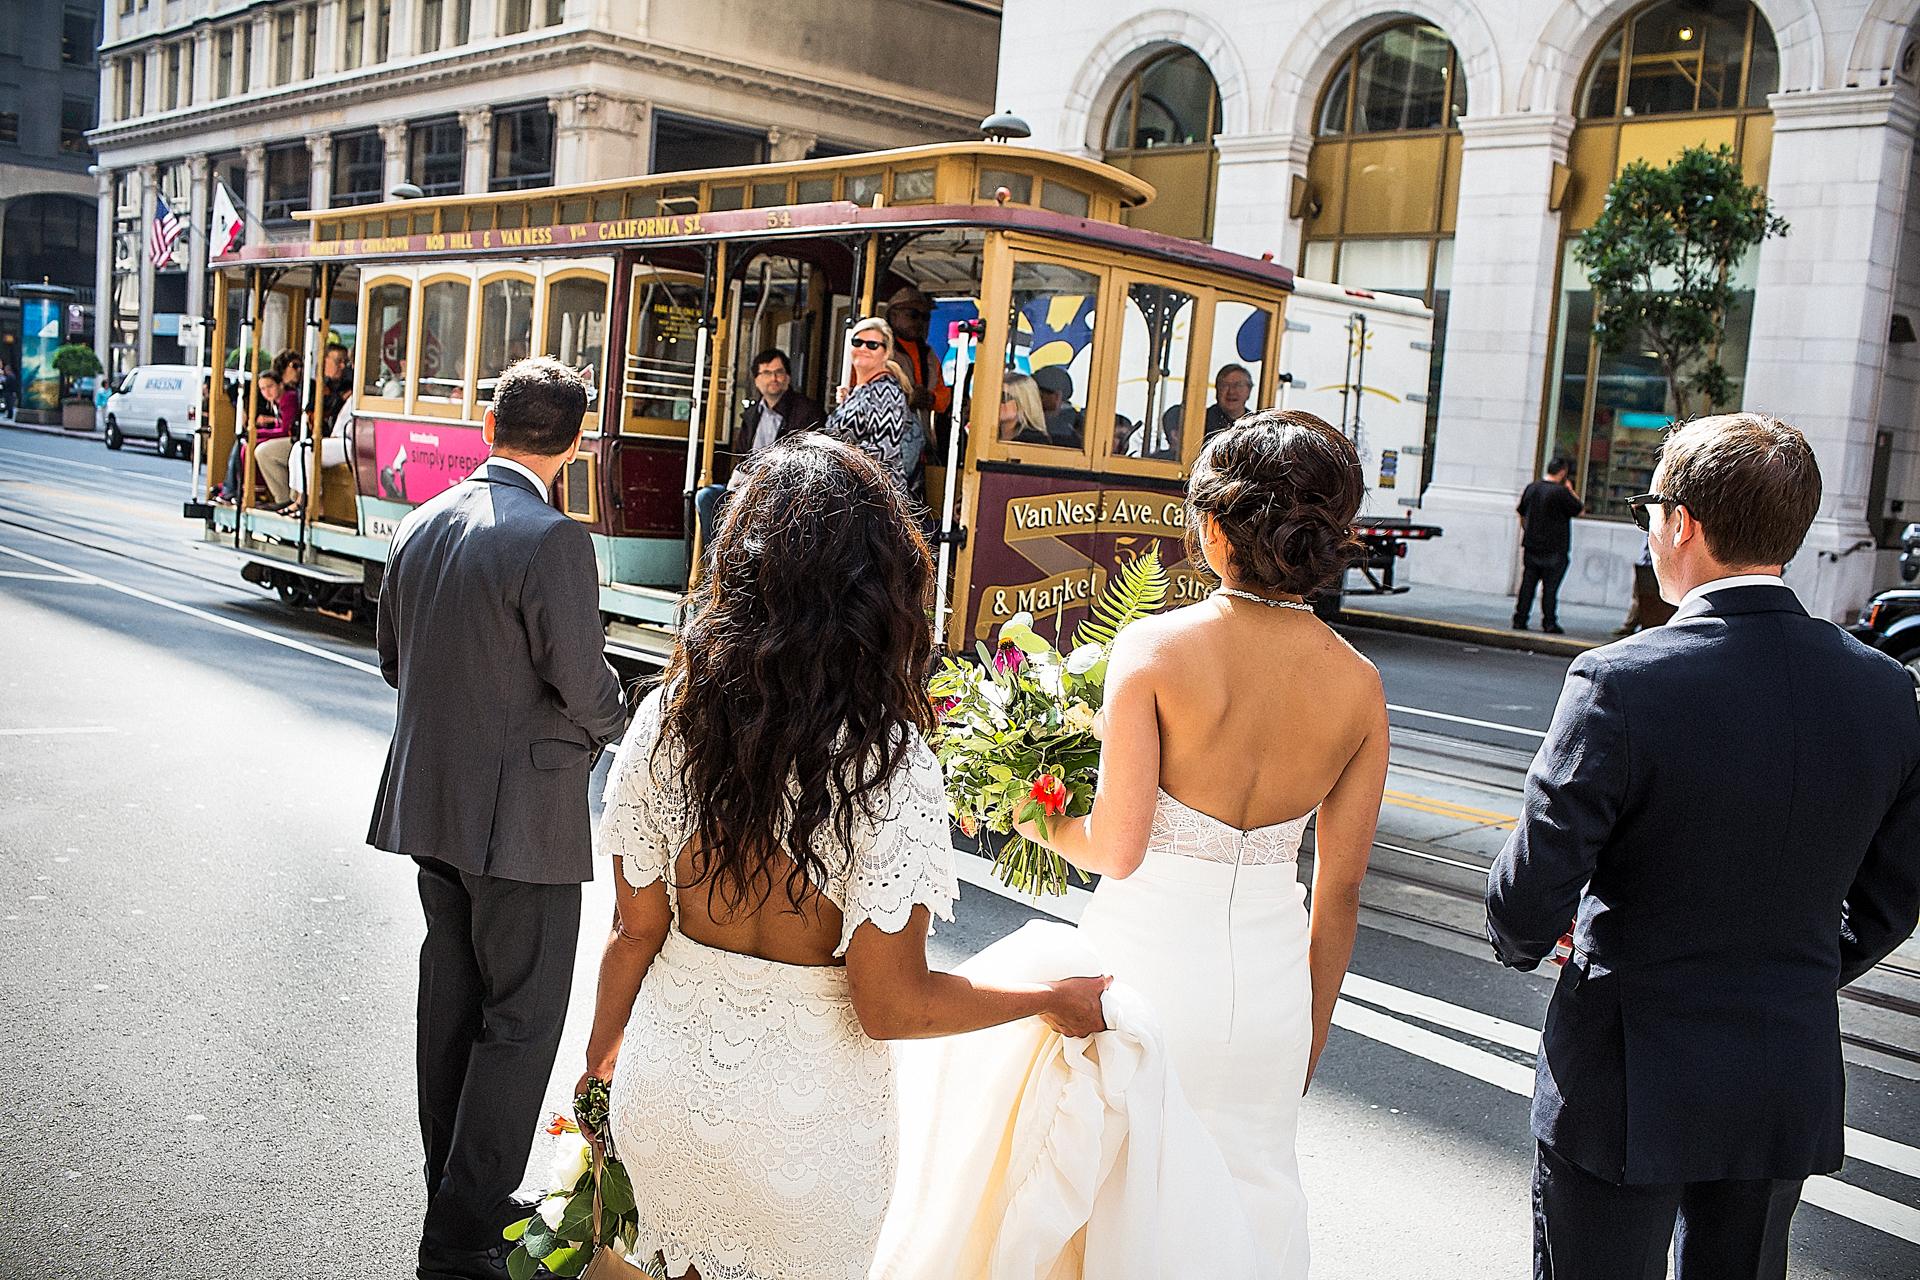 Foto de Elopement del teleférico de San Francisco | el teleférico se nos escapó sin parar